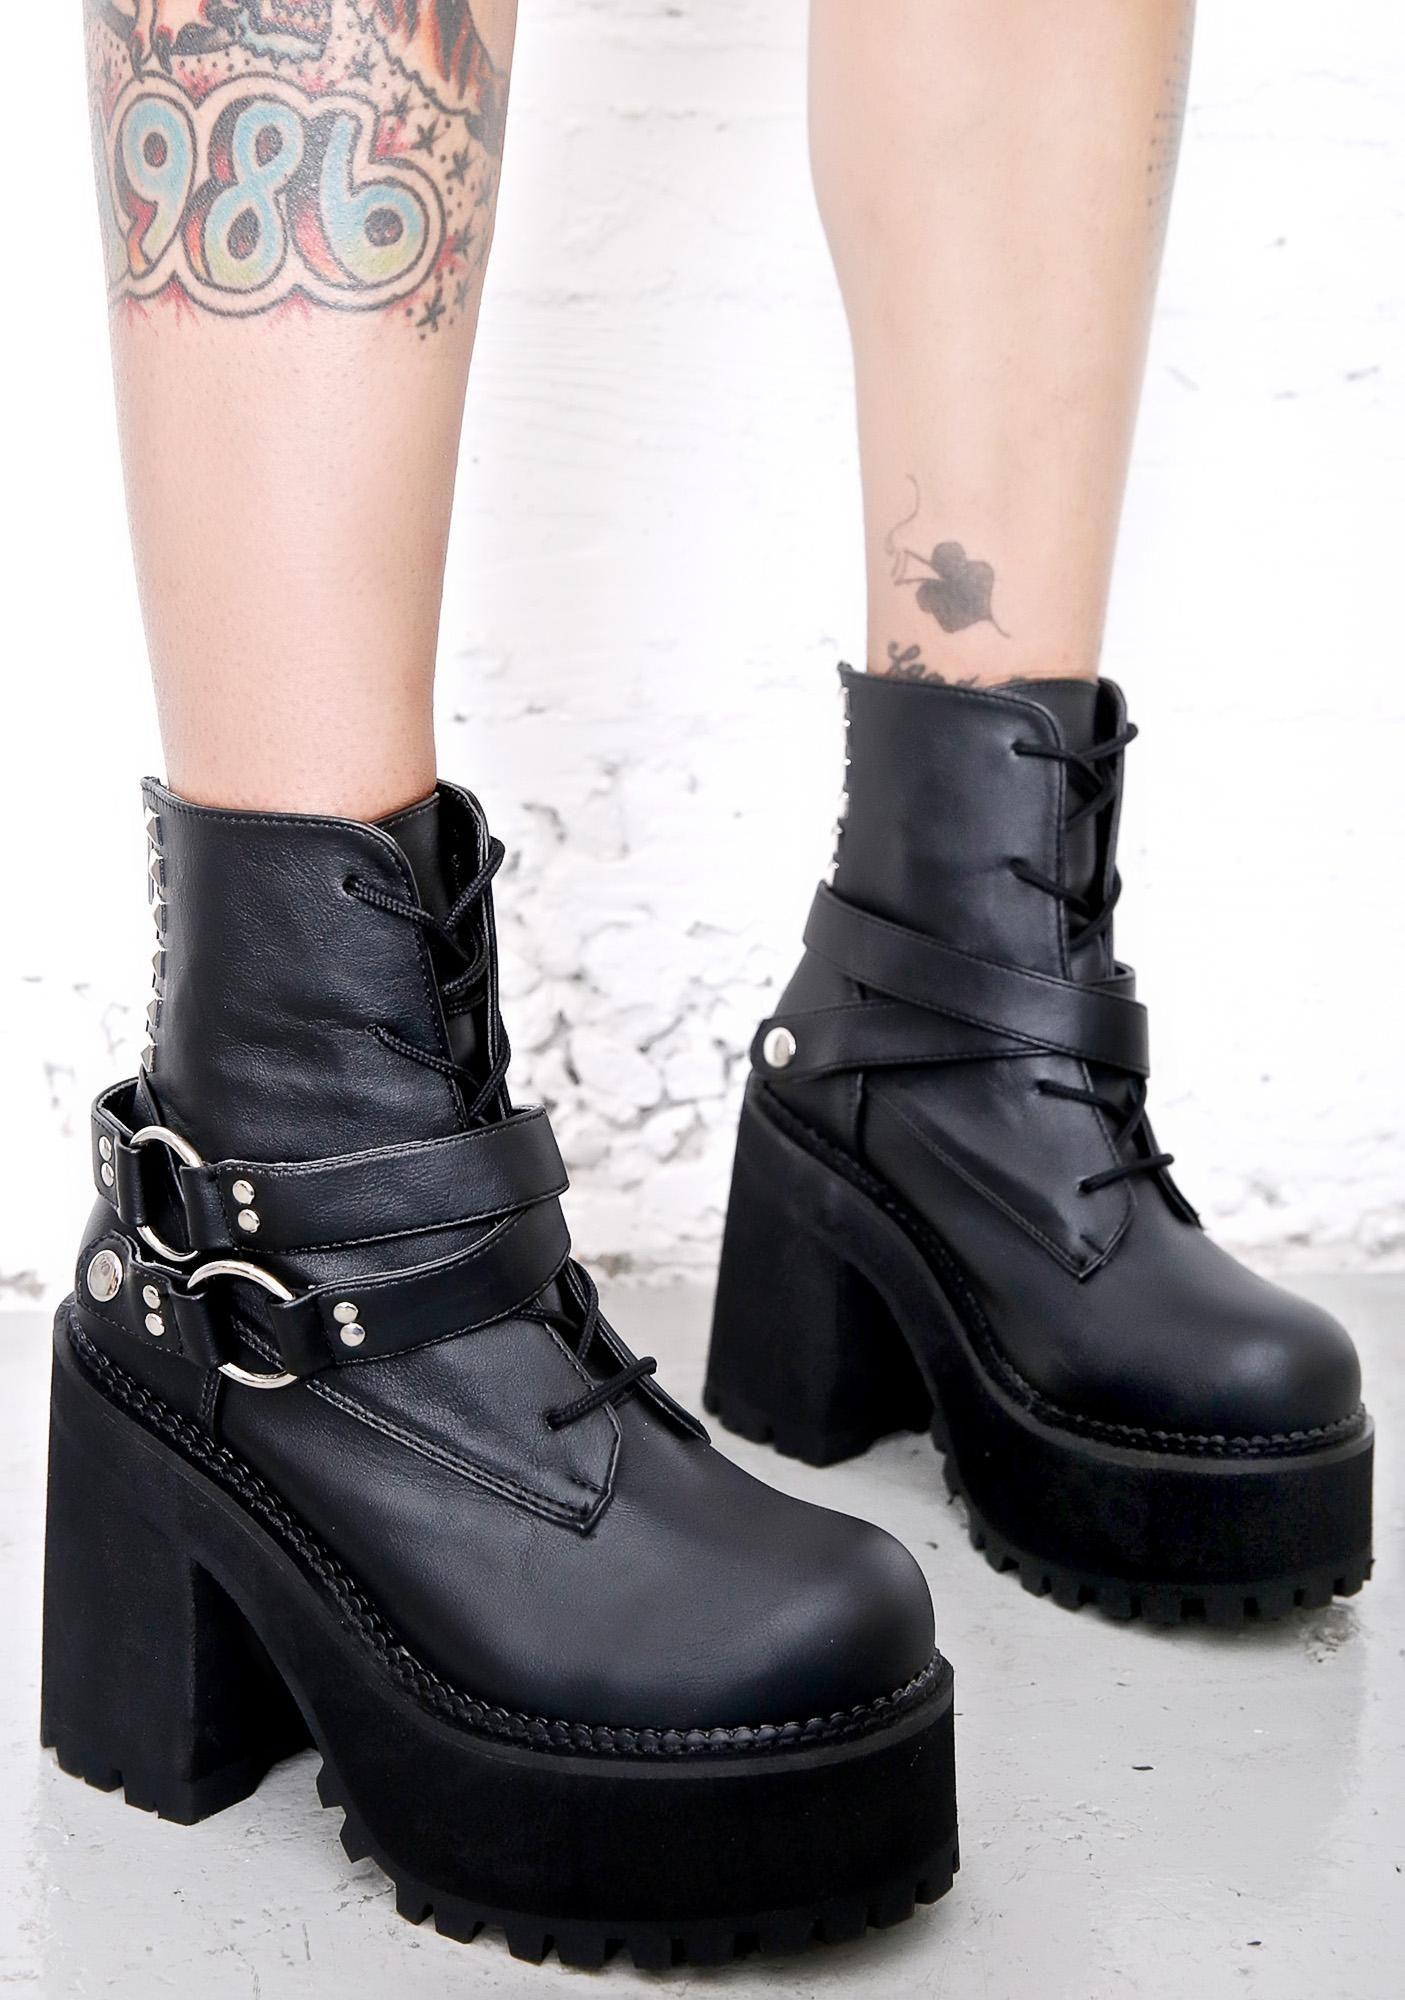 ed554da80dd1 Demonia Reign Of Terror Platform Boots cuz yer absolutely ruthless